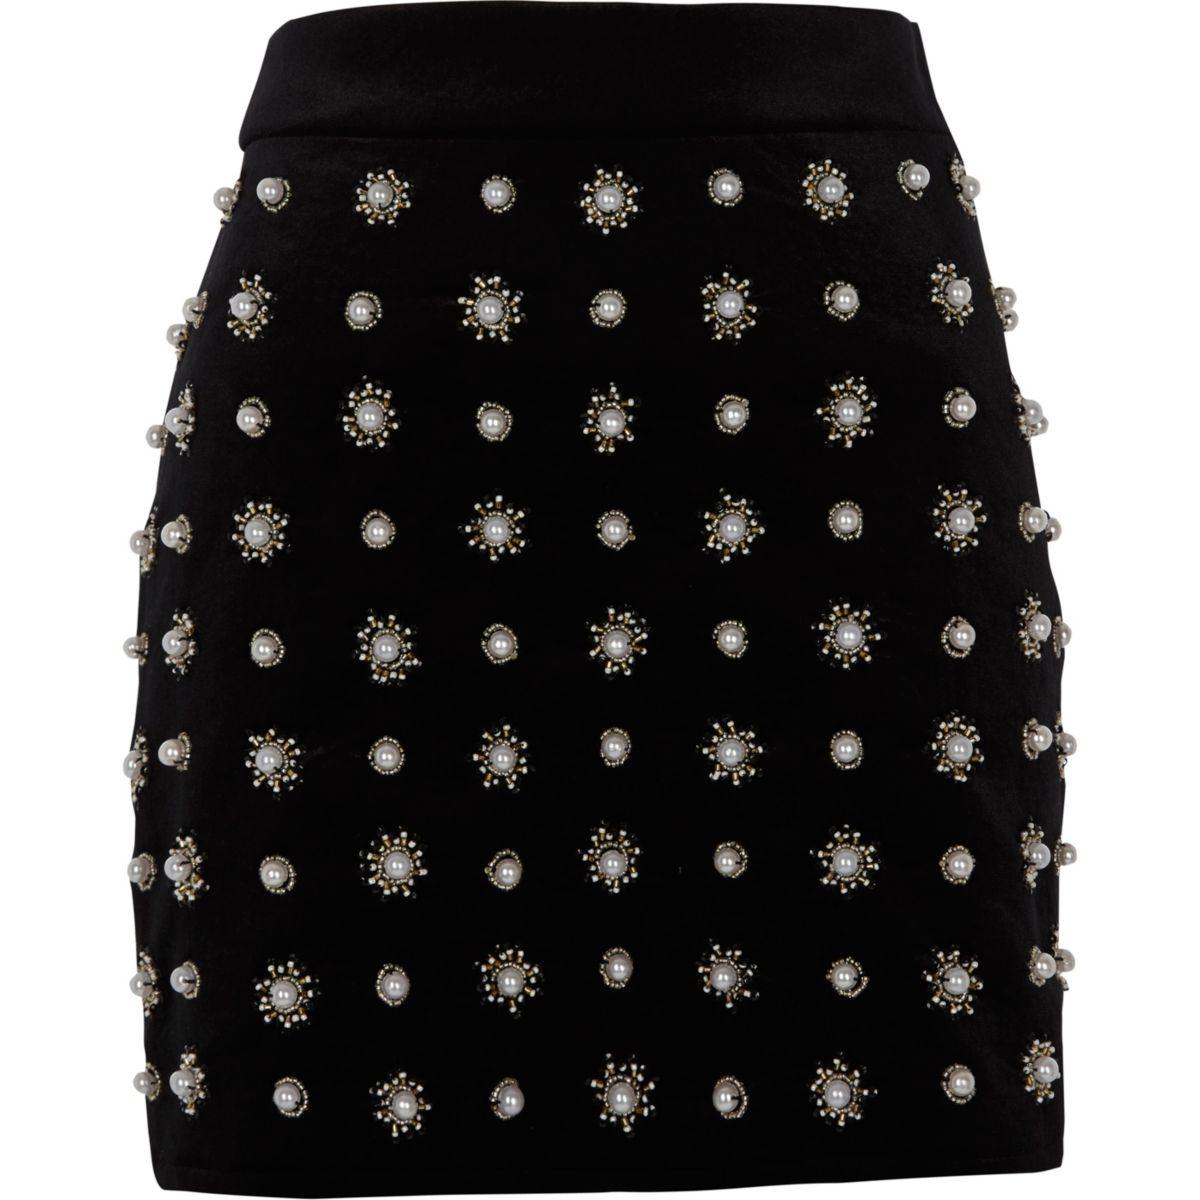 Black faux pearl embellished mini skirt